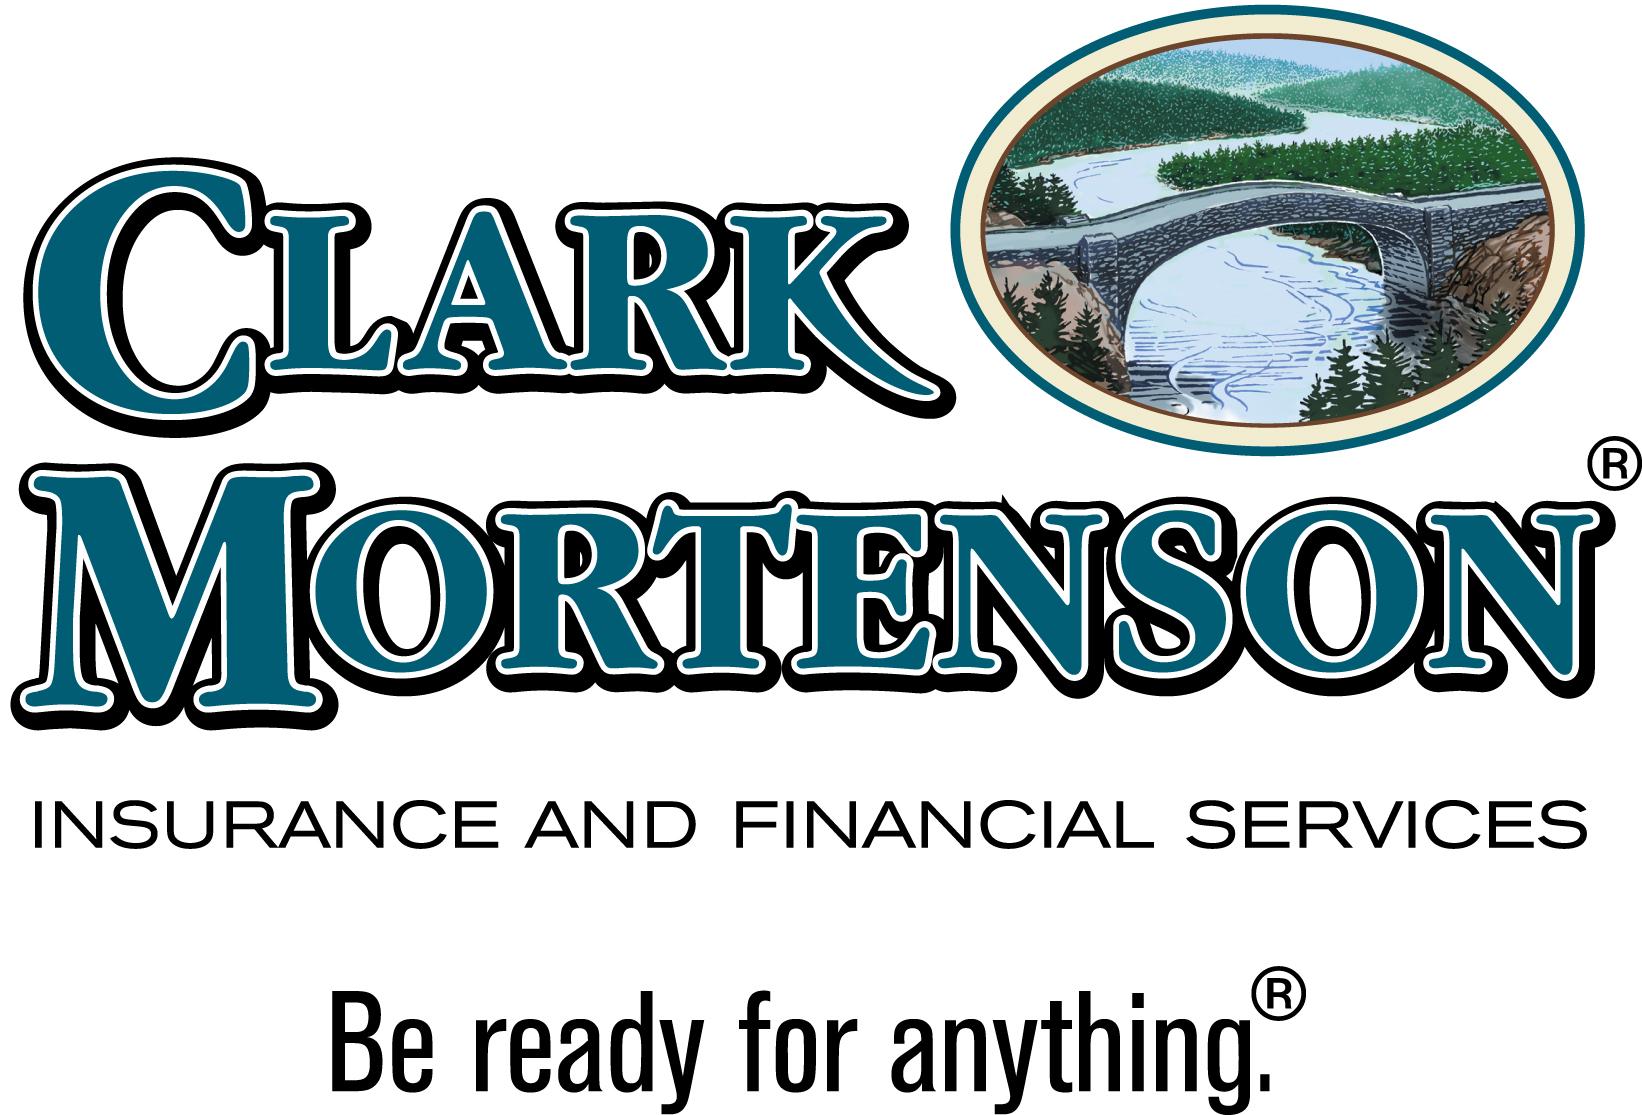 Clark Mortenson